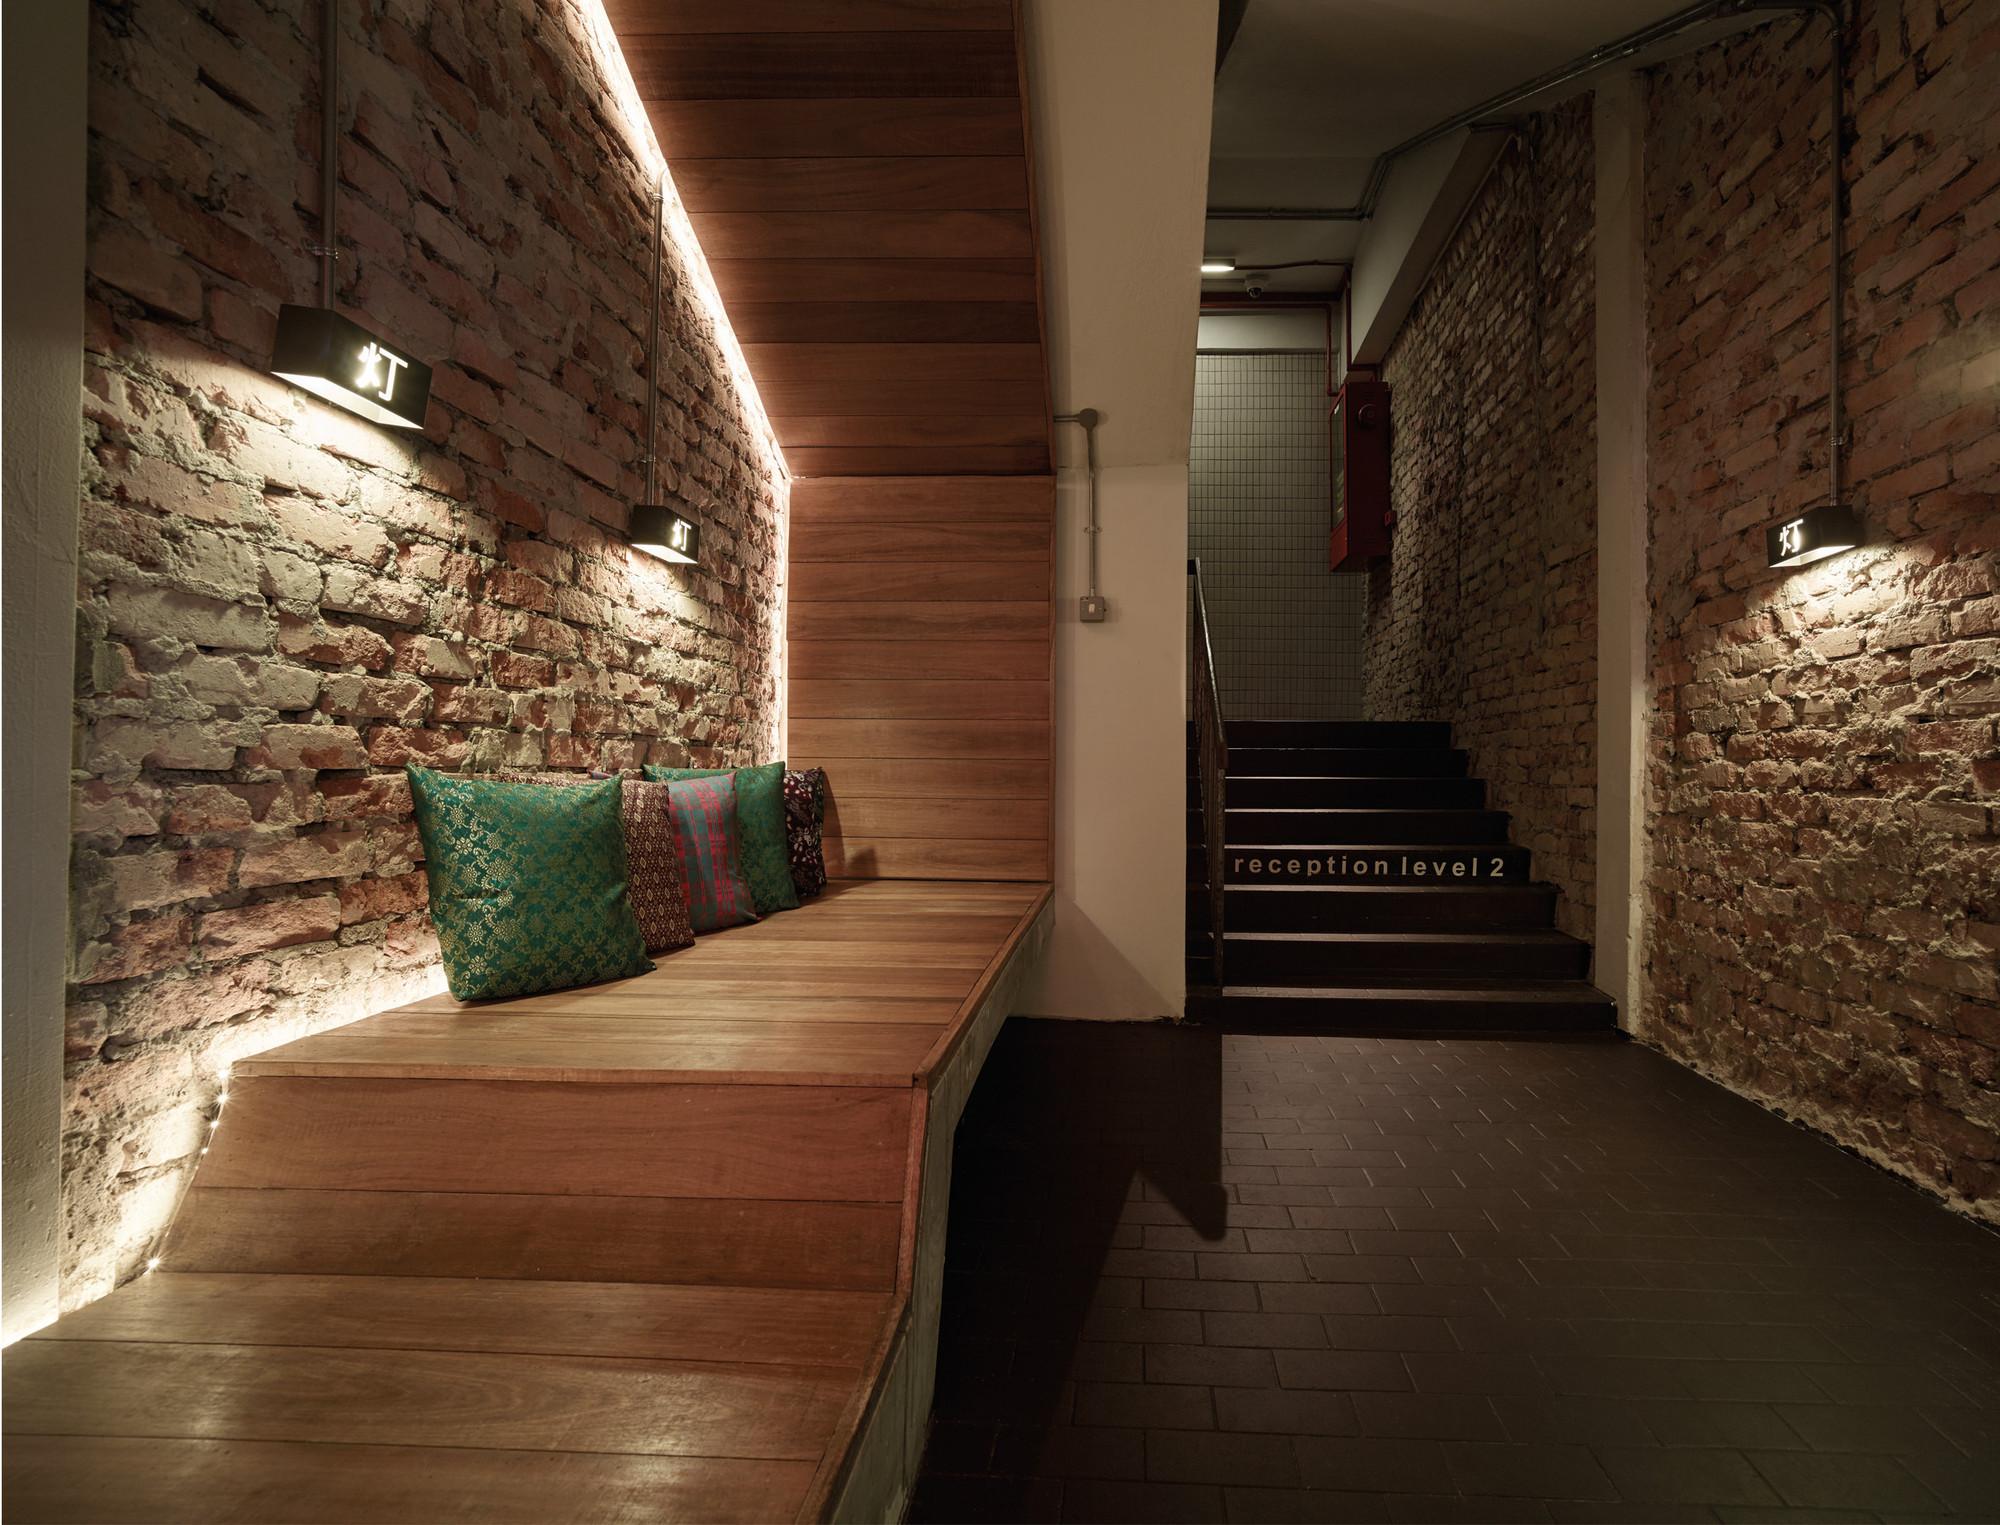 Lantern Hotel Zlgdesign Archdaily